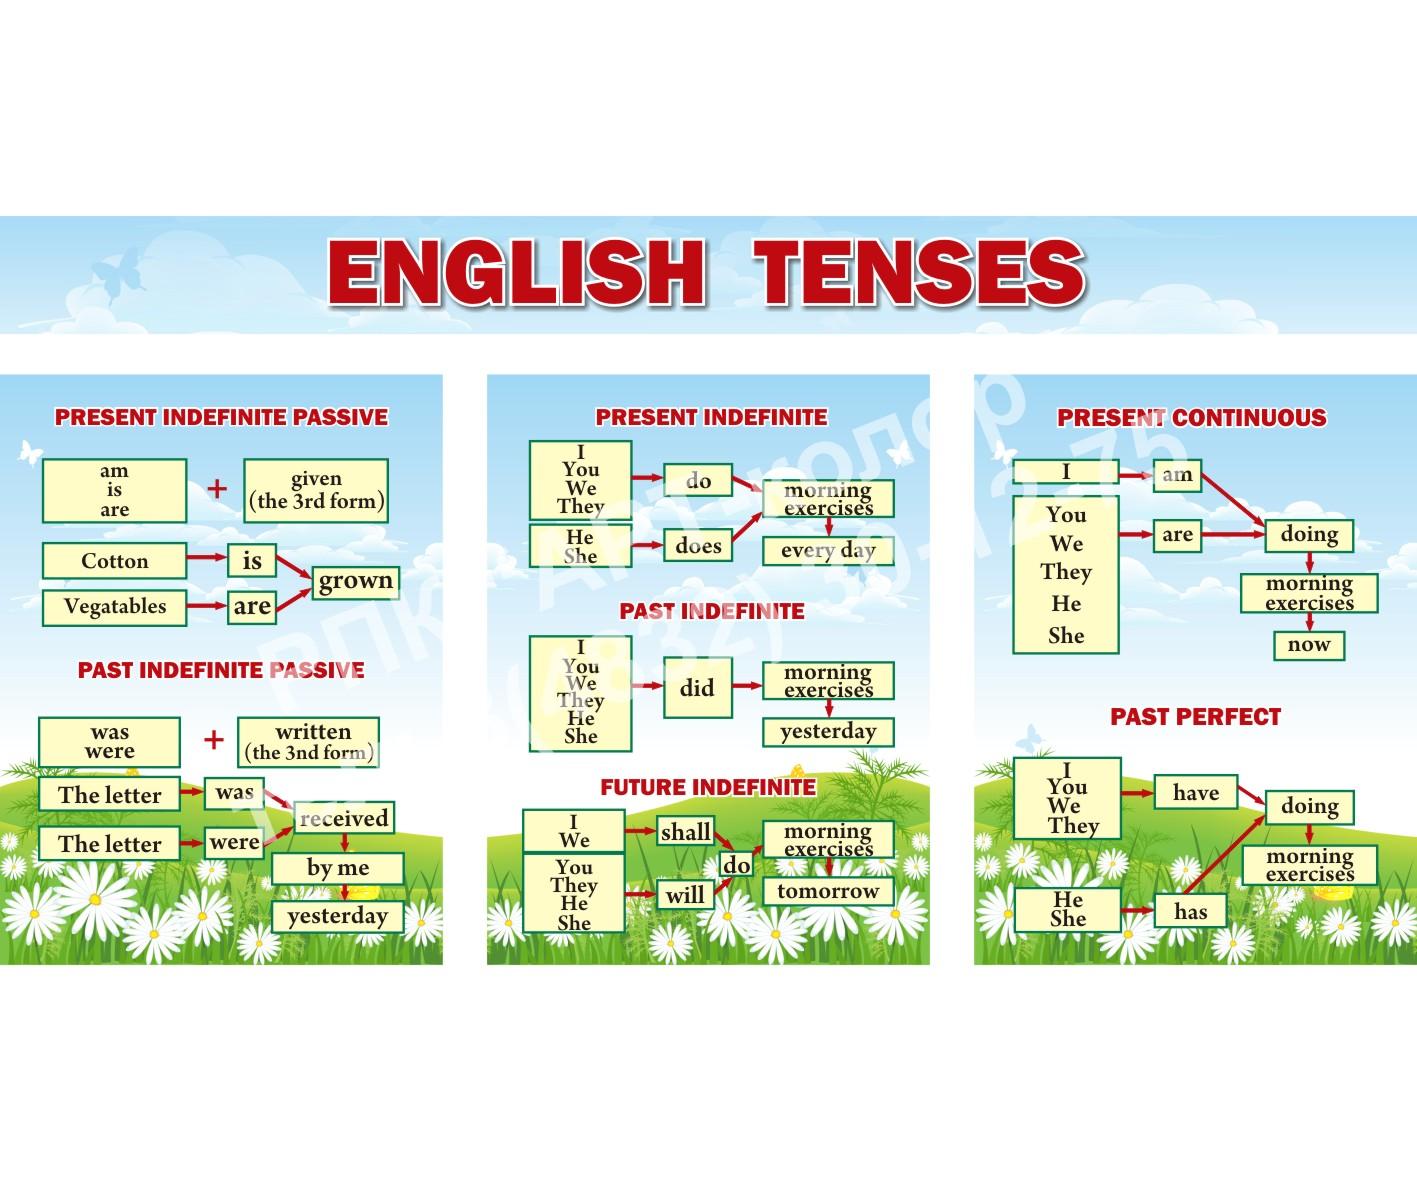 Еnglish tenses